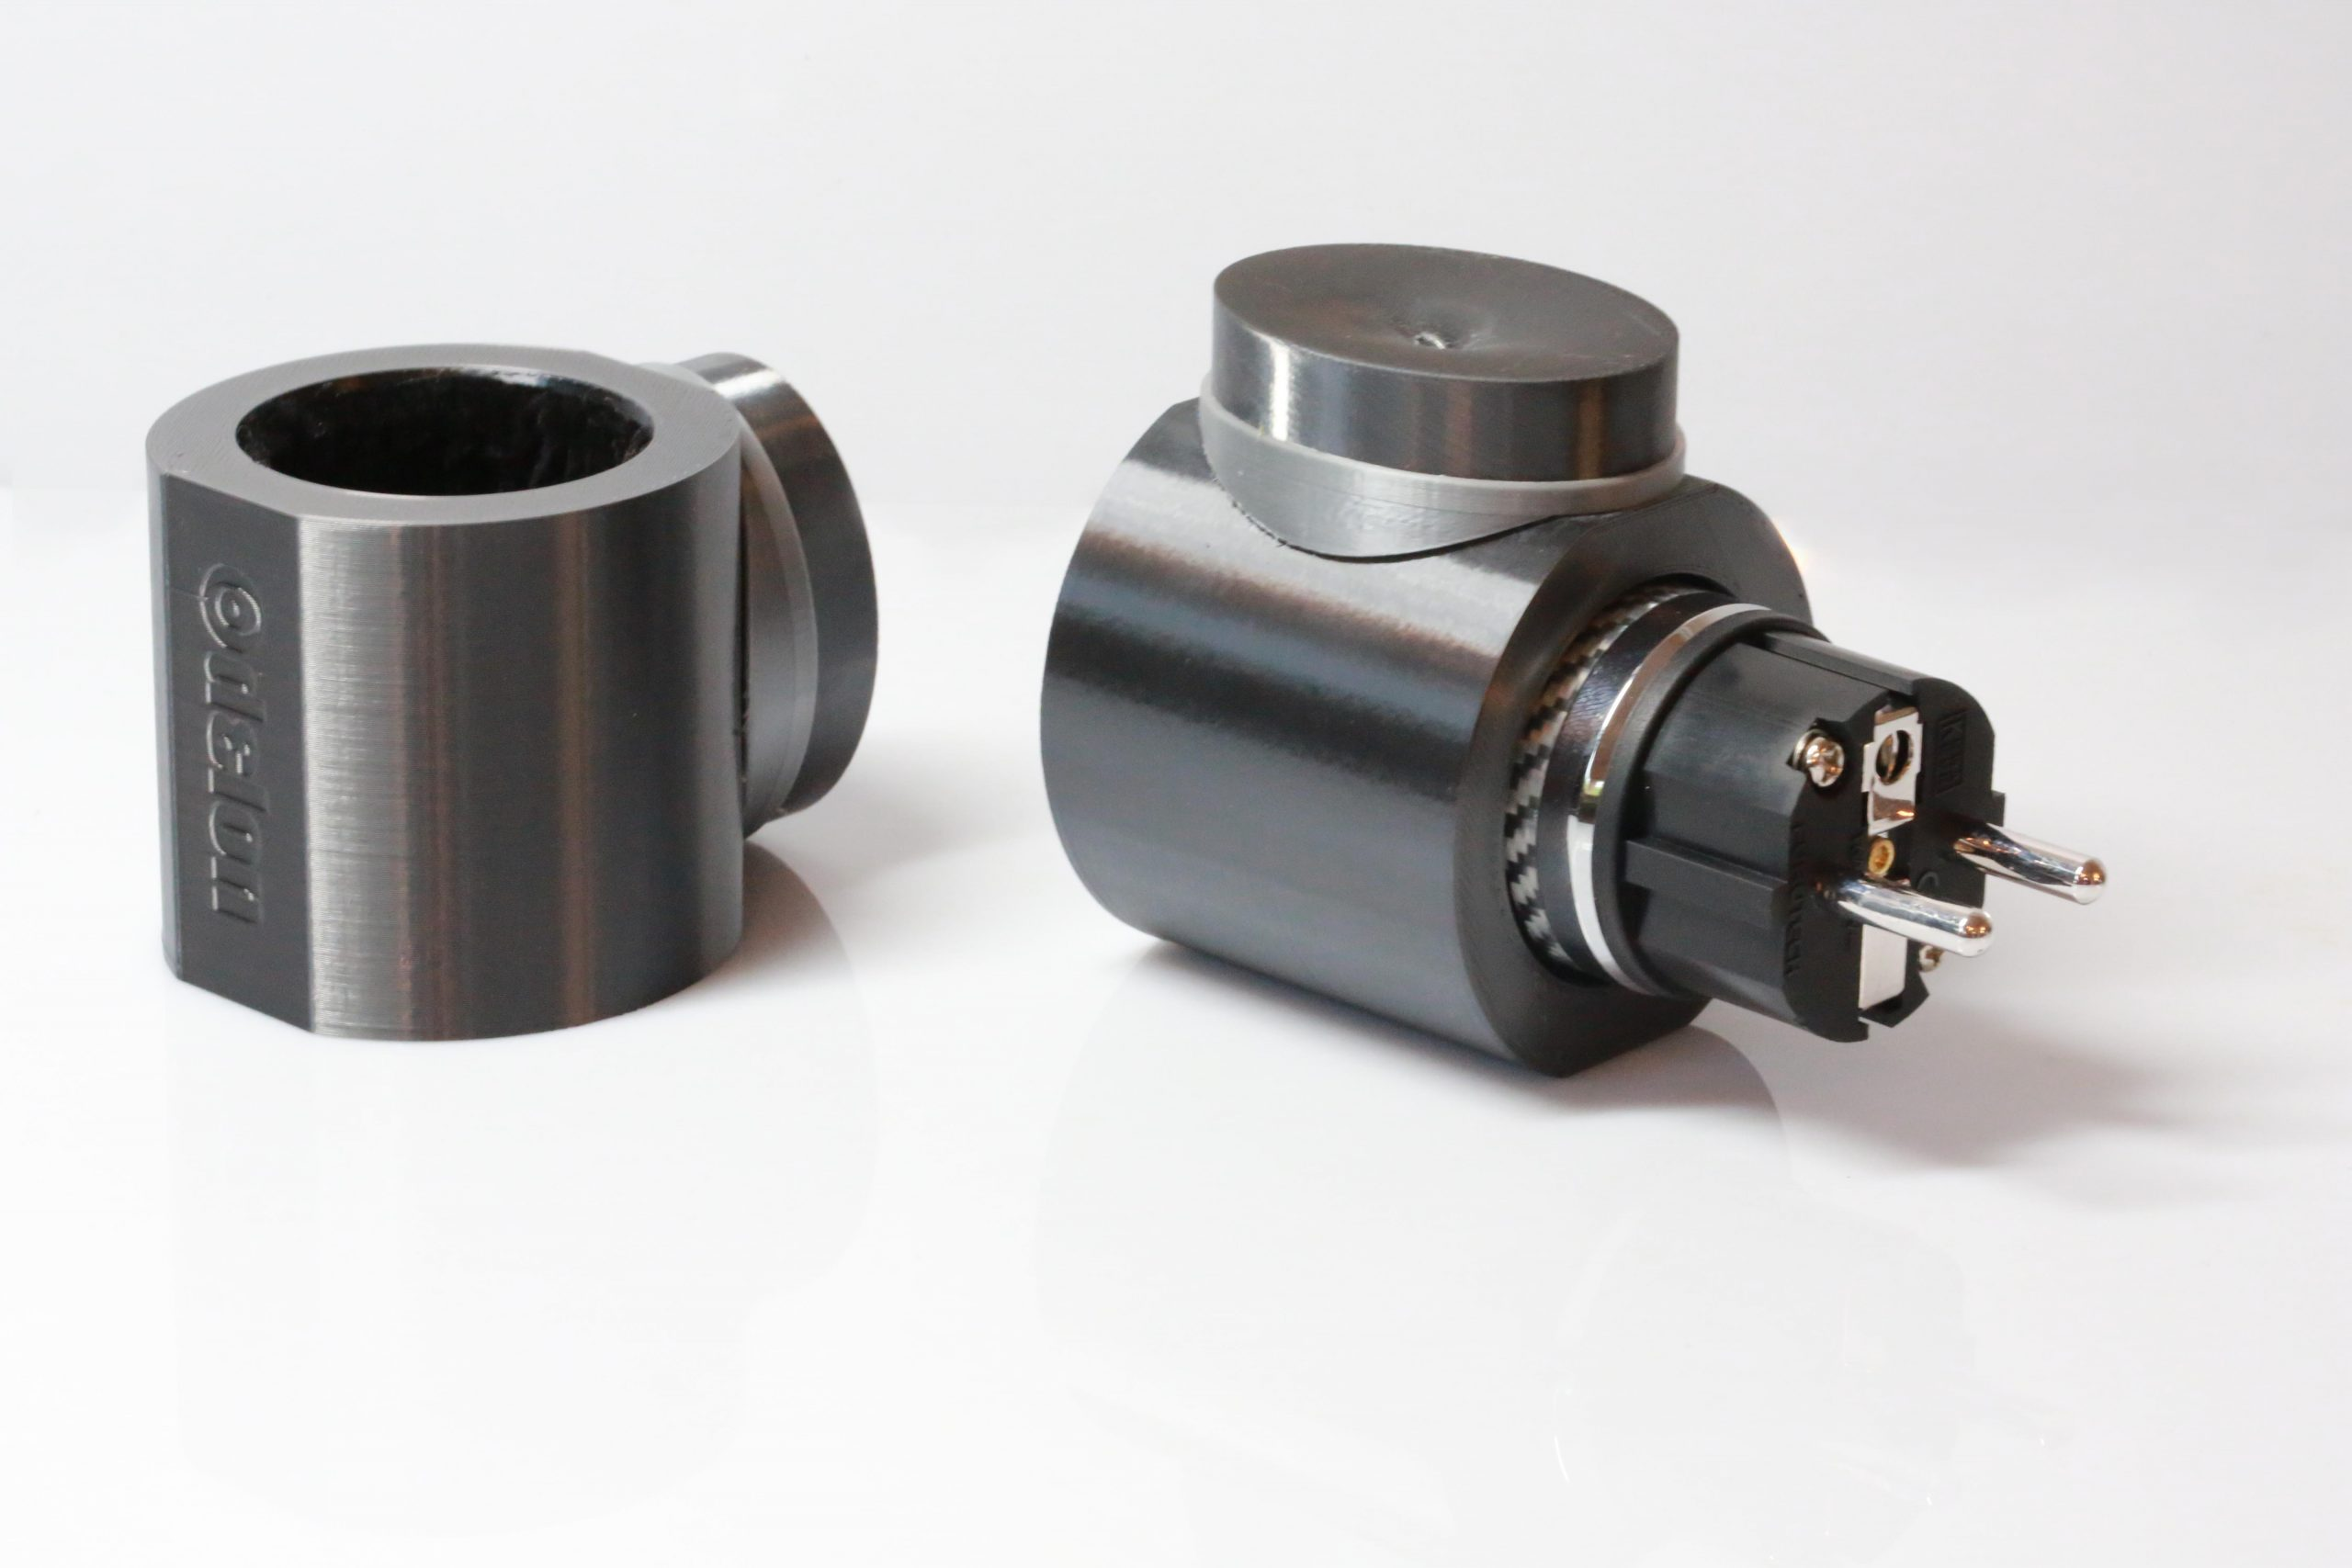 Odeion Power Rings Sigma accessoires secteur